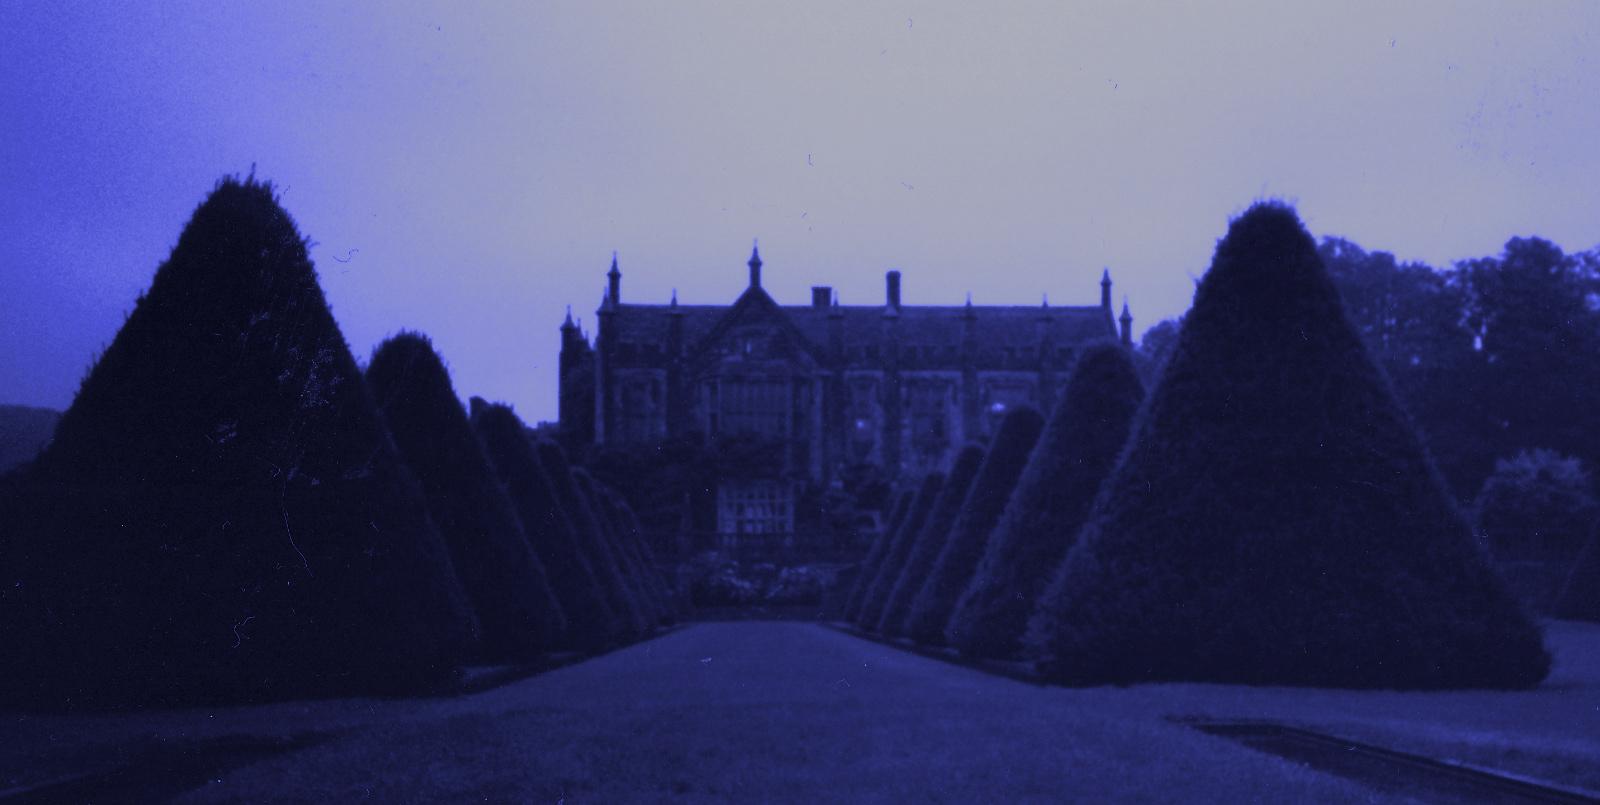 Episode 45 – Haunted Dorset